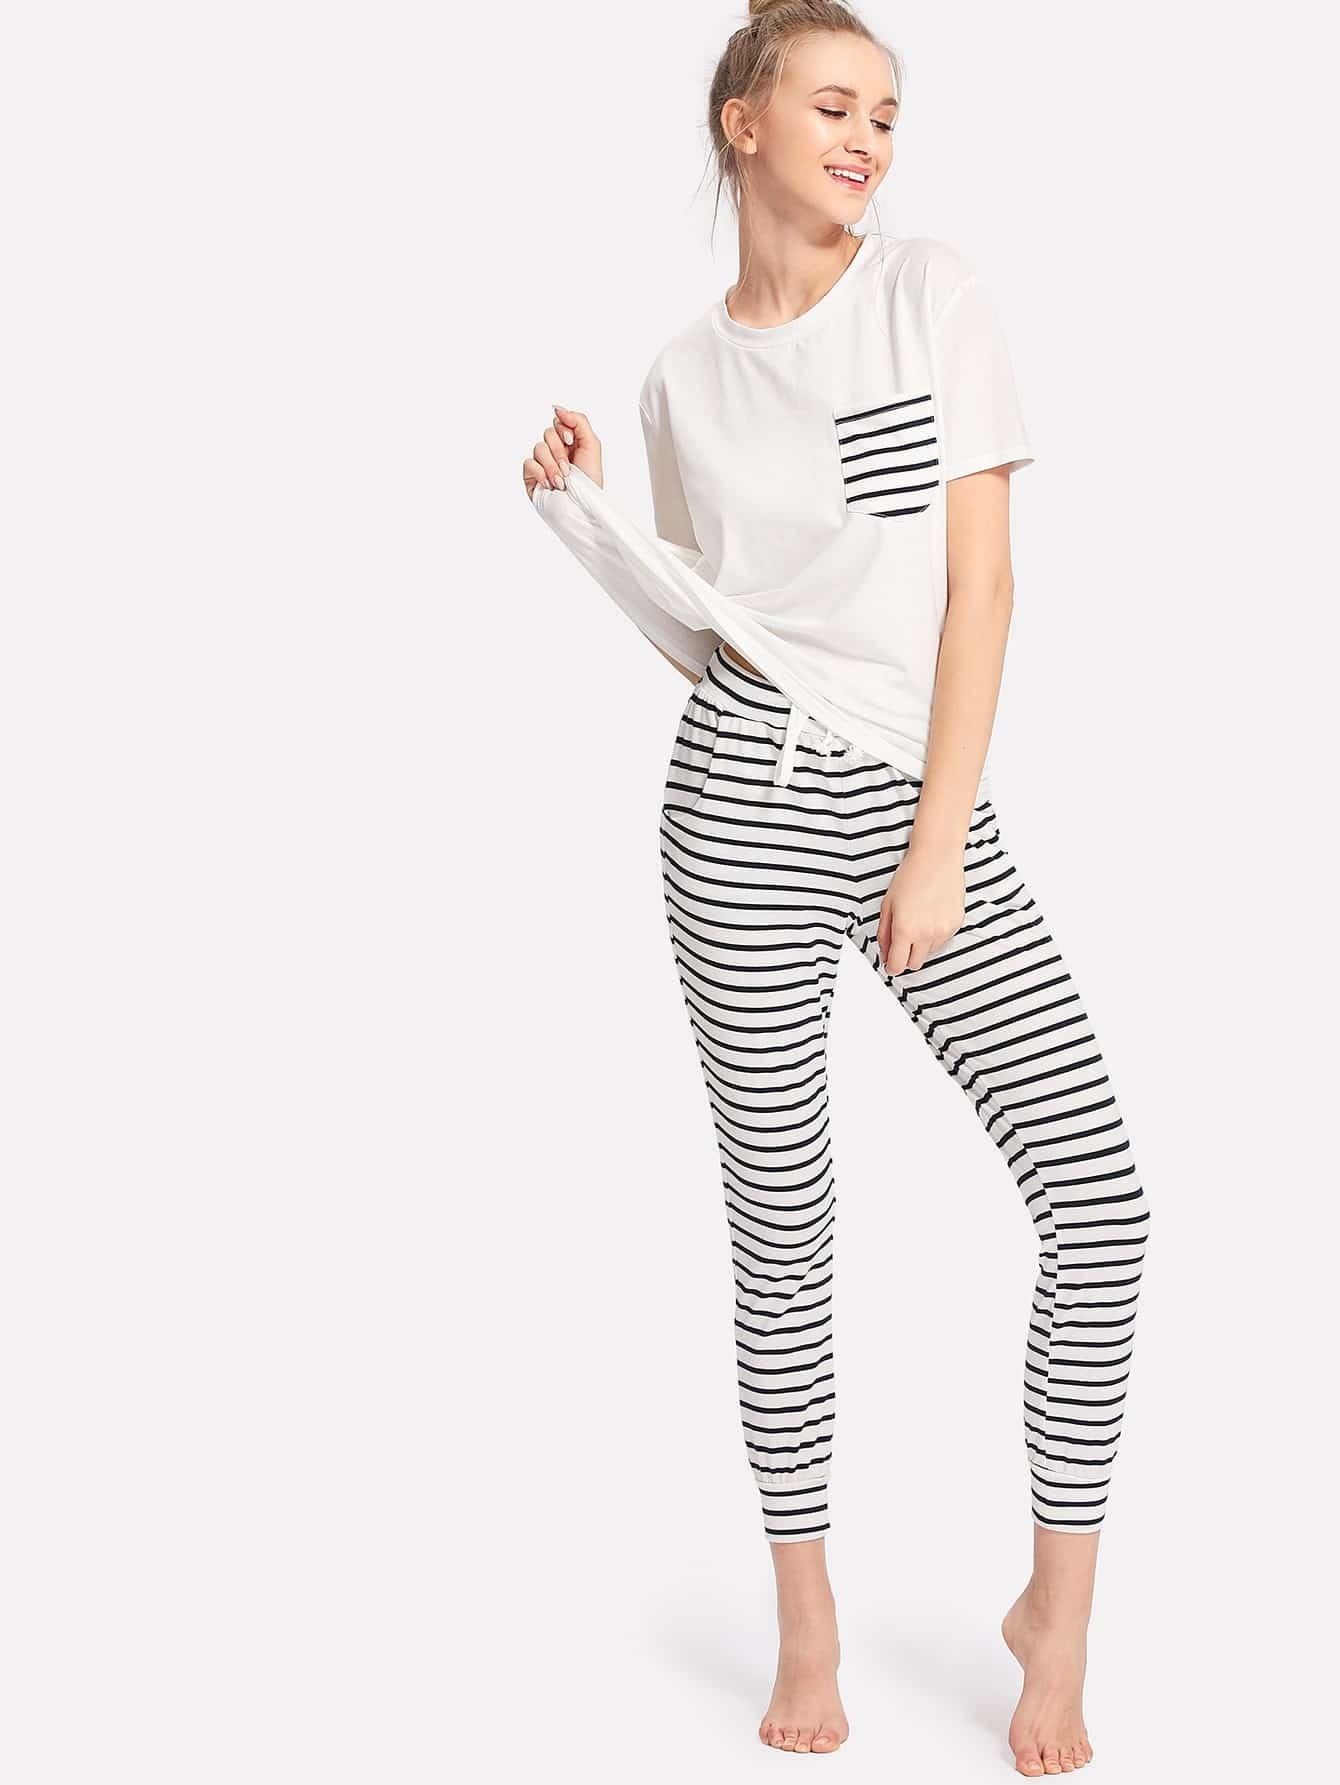 Patch Pocket Tee And Striped Pants PJ Set